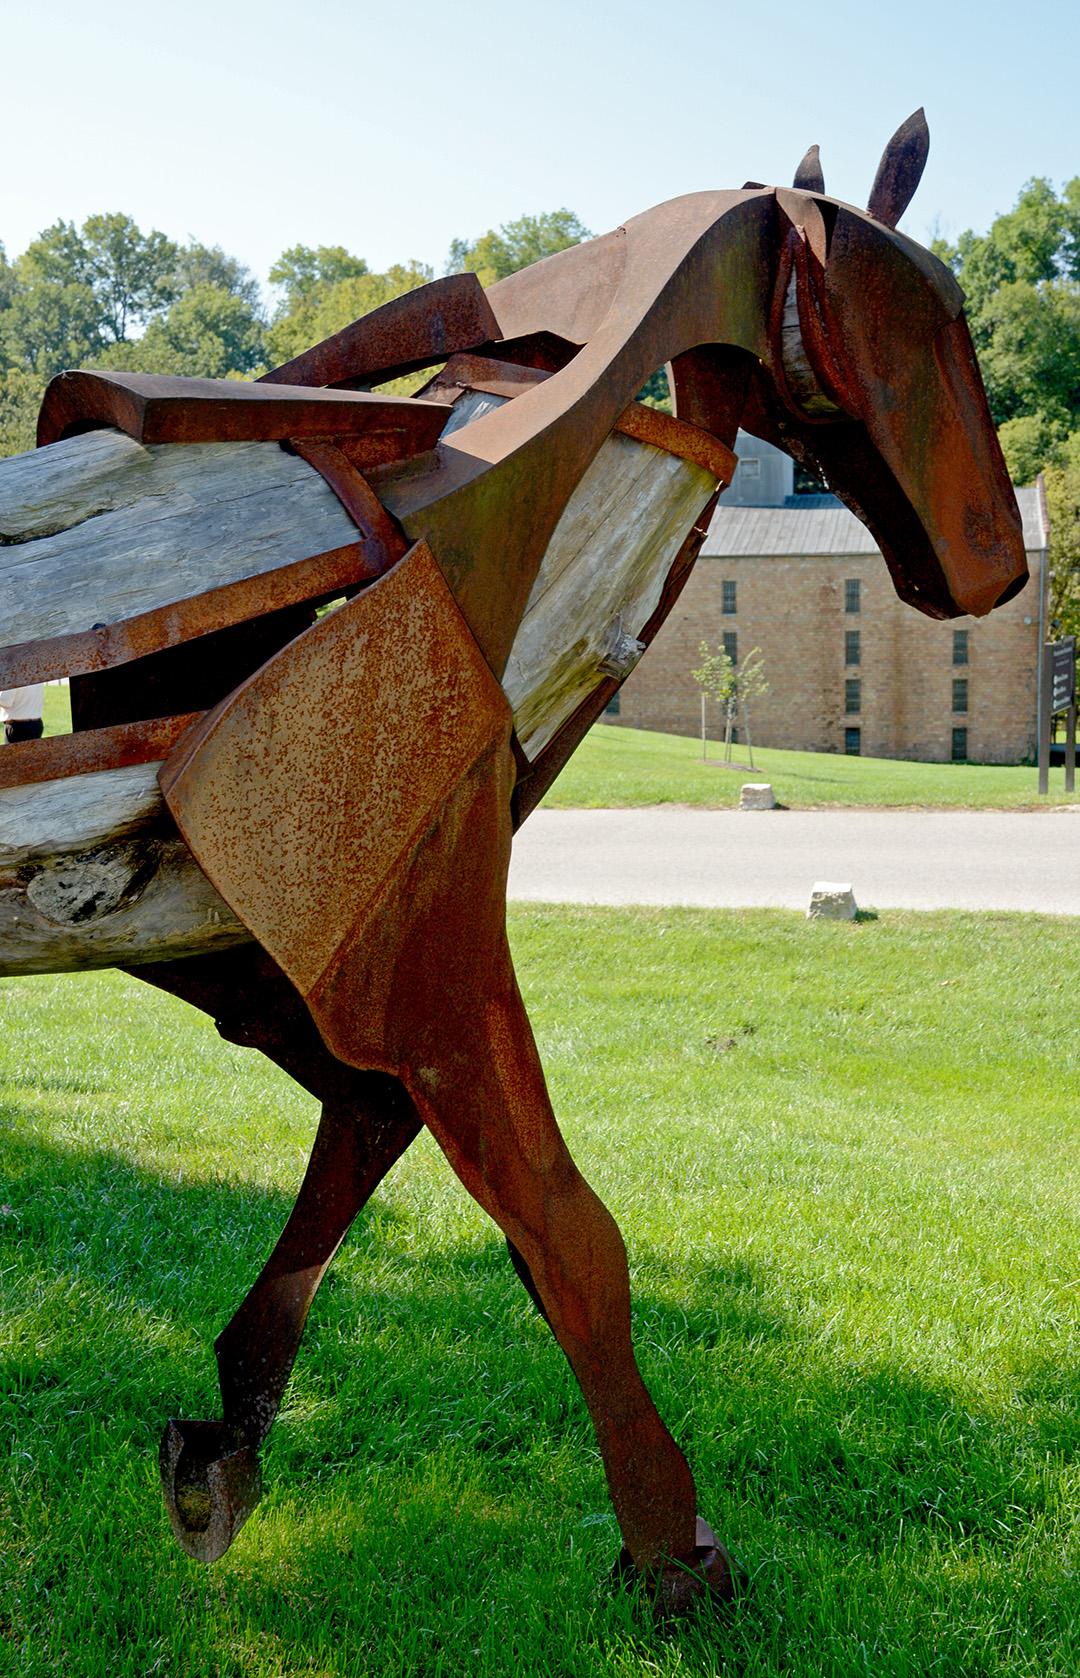 Horse sculpture outside Woodford Reserve Distillery.